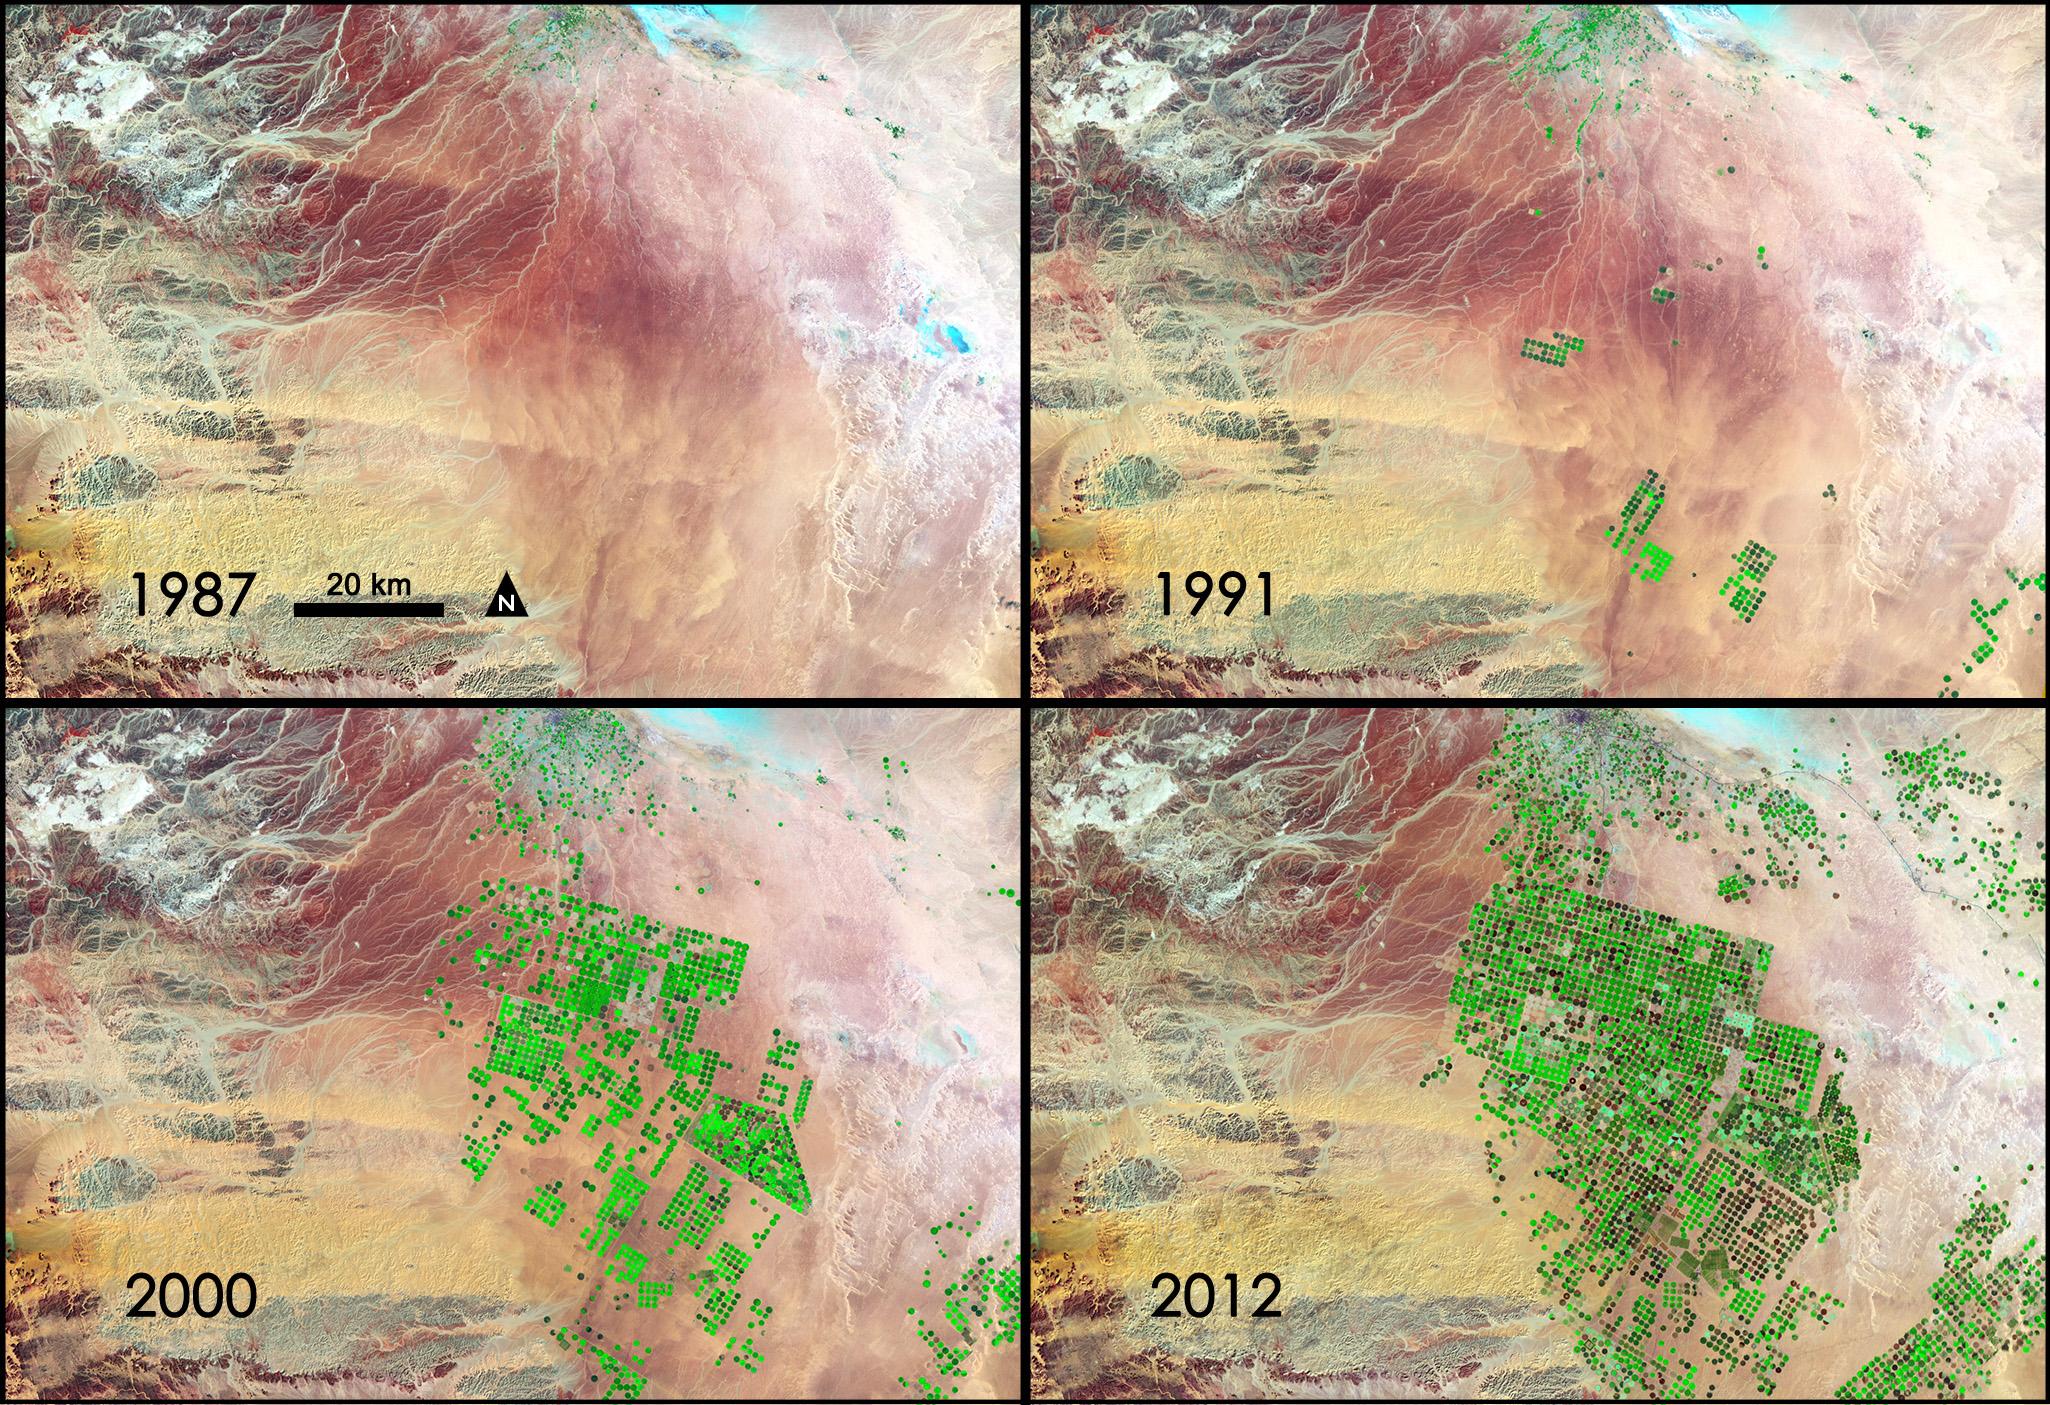 NASA - NASA Sees Fields of Green Spring up in Saudi Arabia